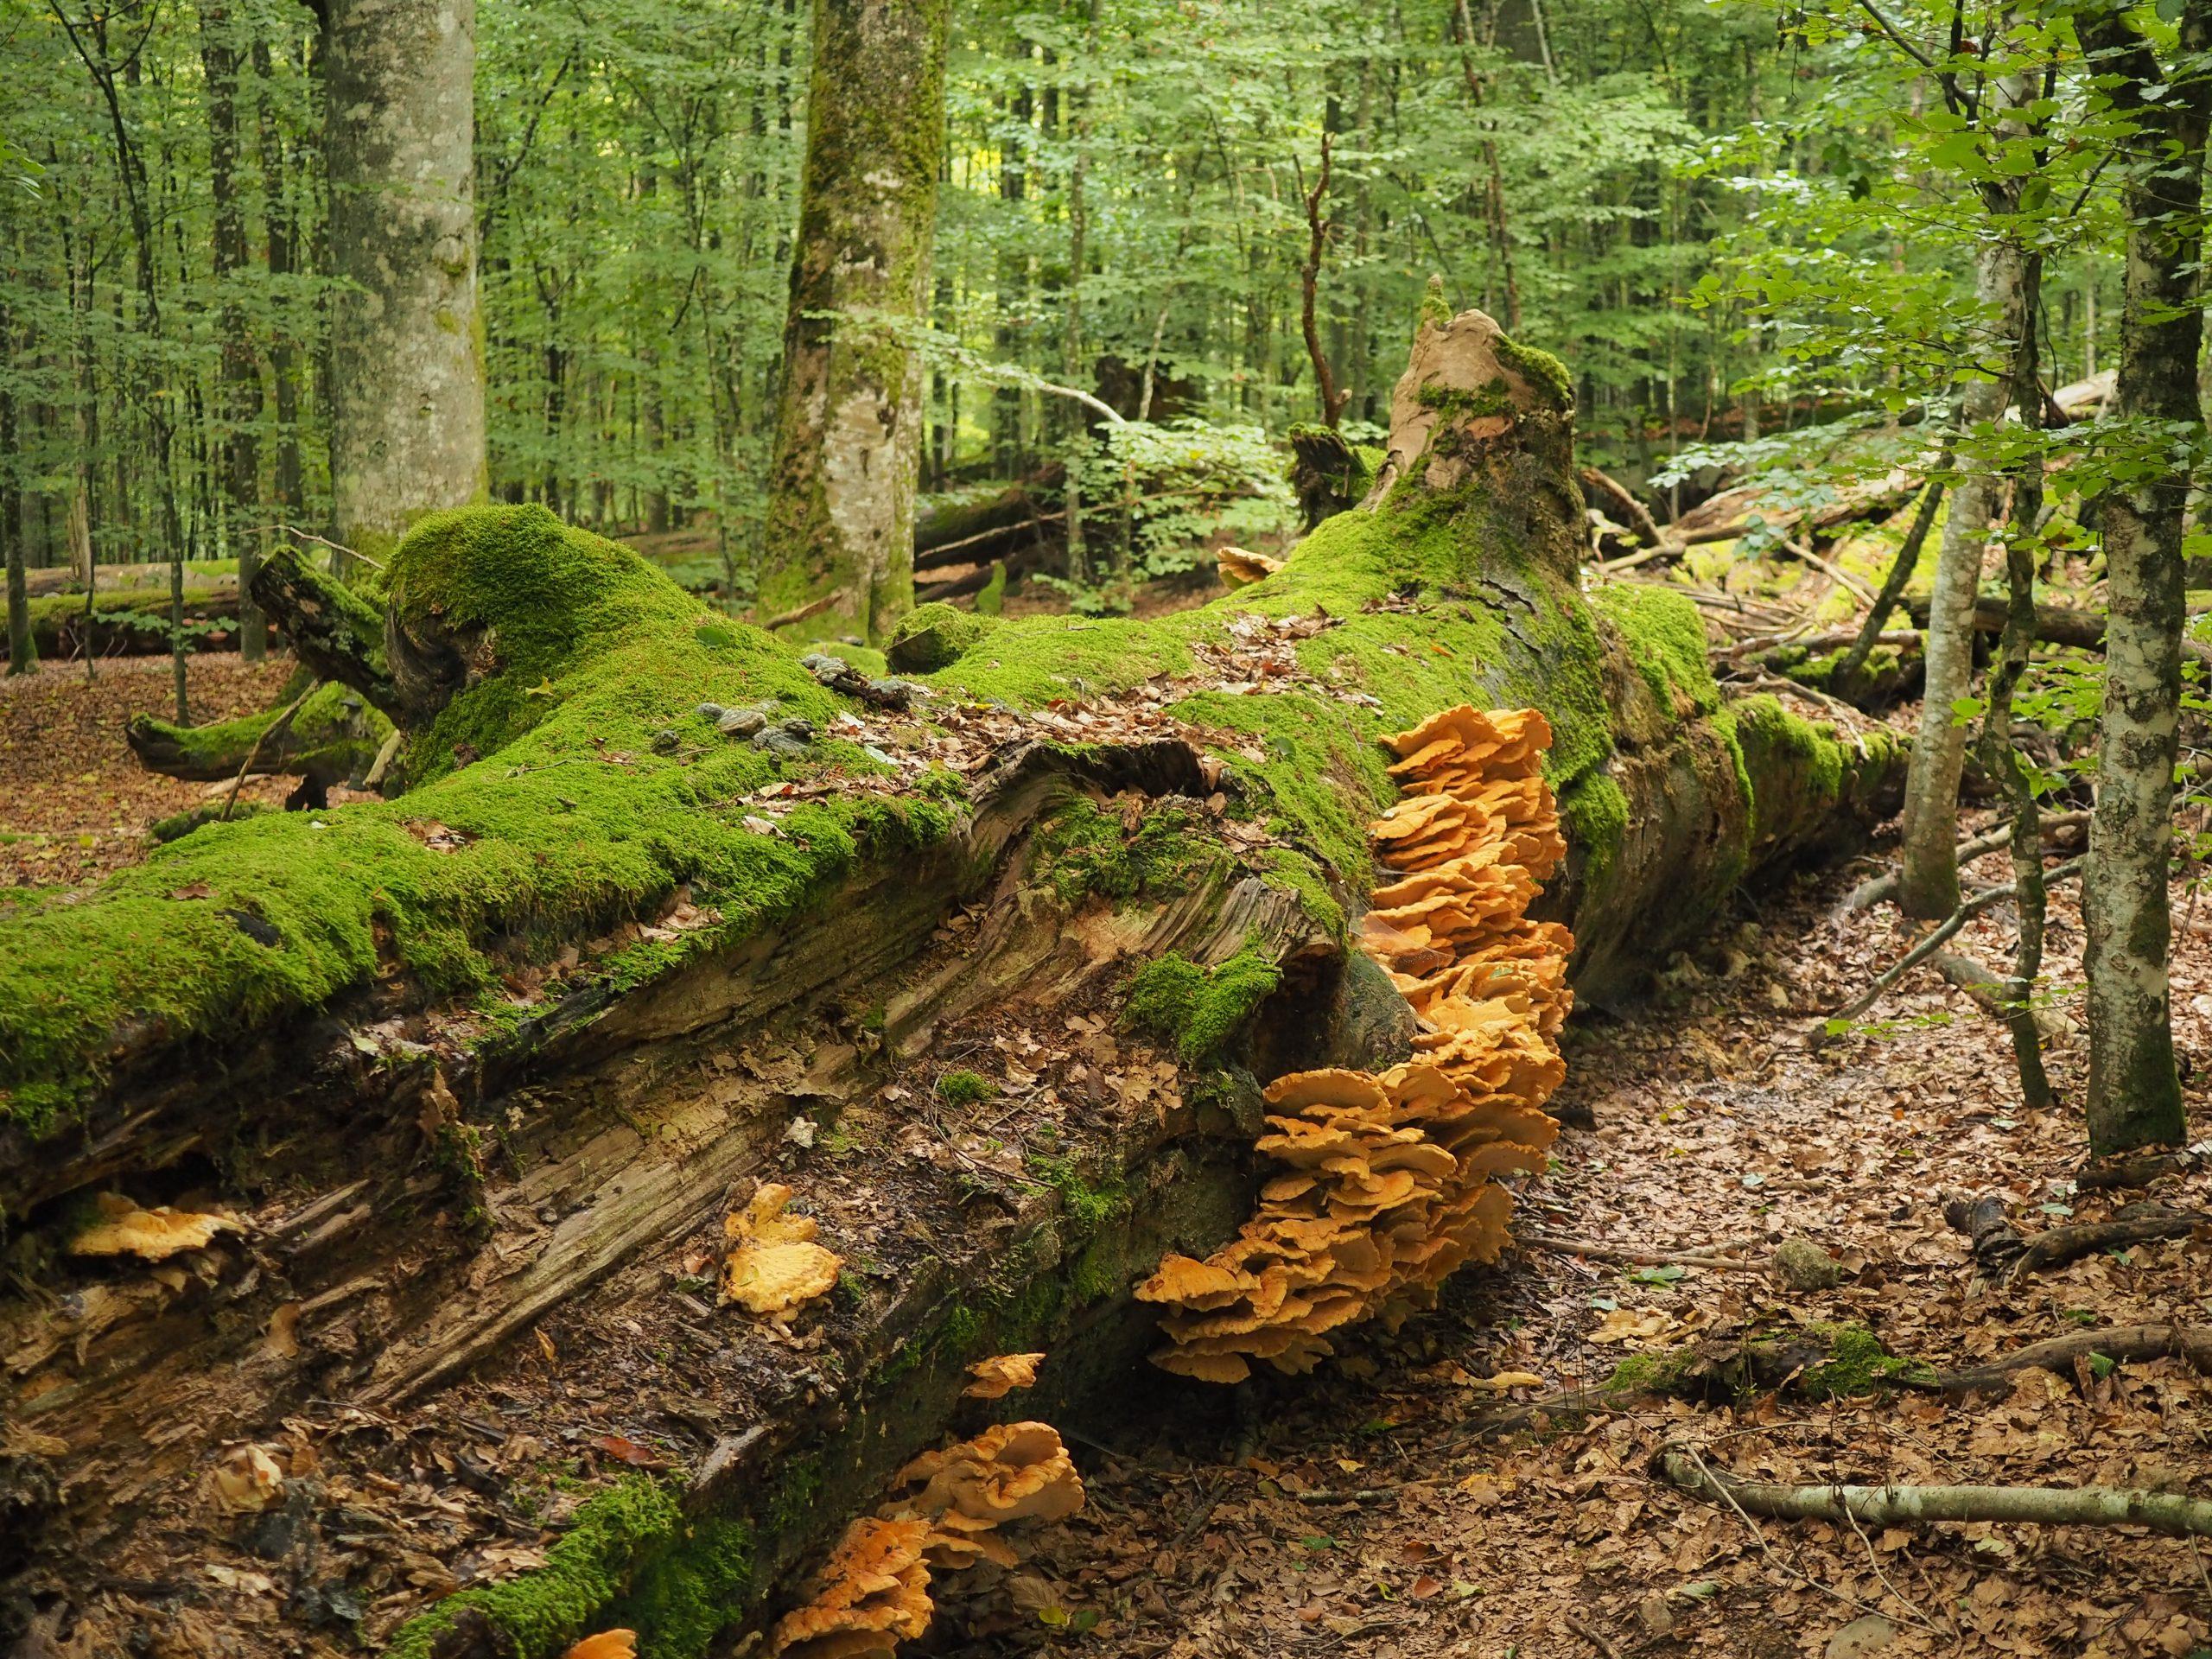 Franz Leibl/Nationalpark Bayerischer Wald